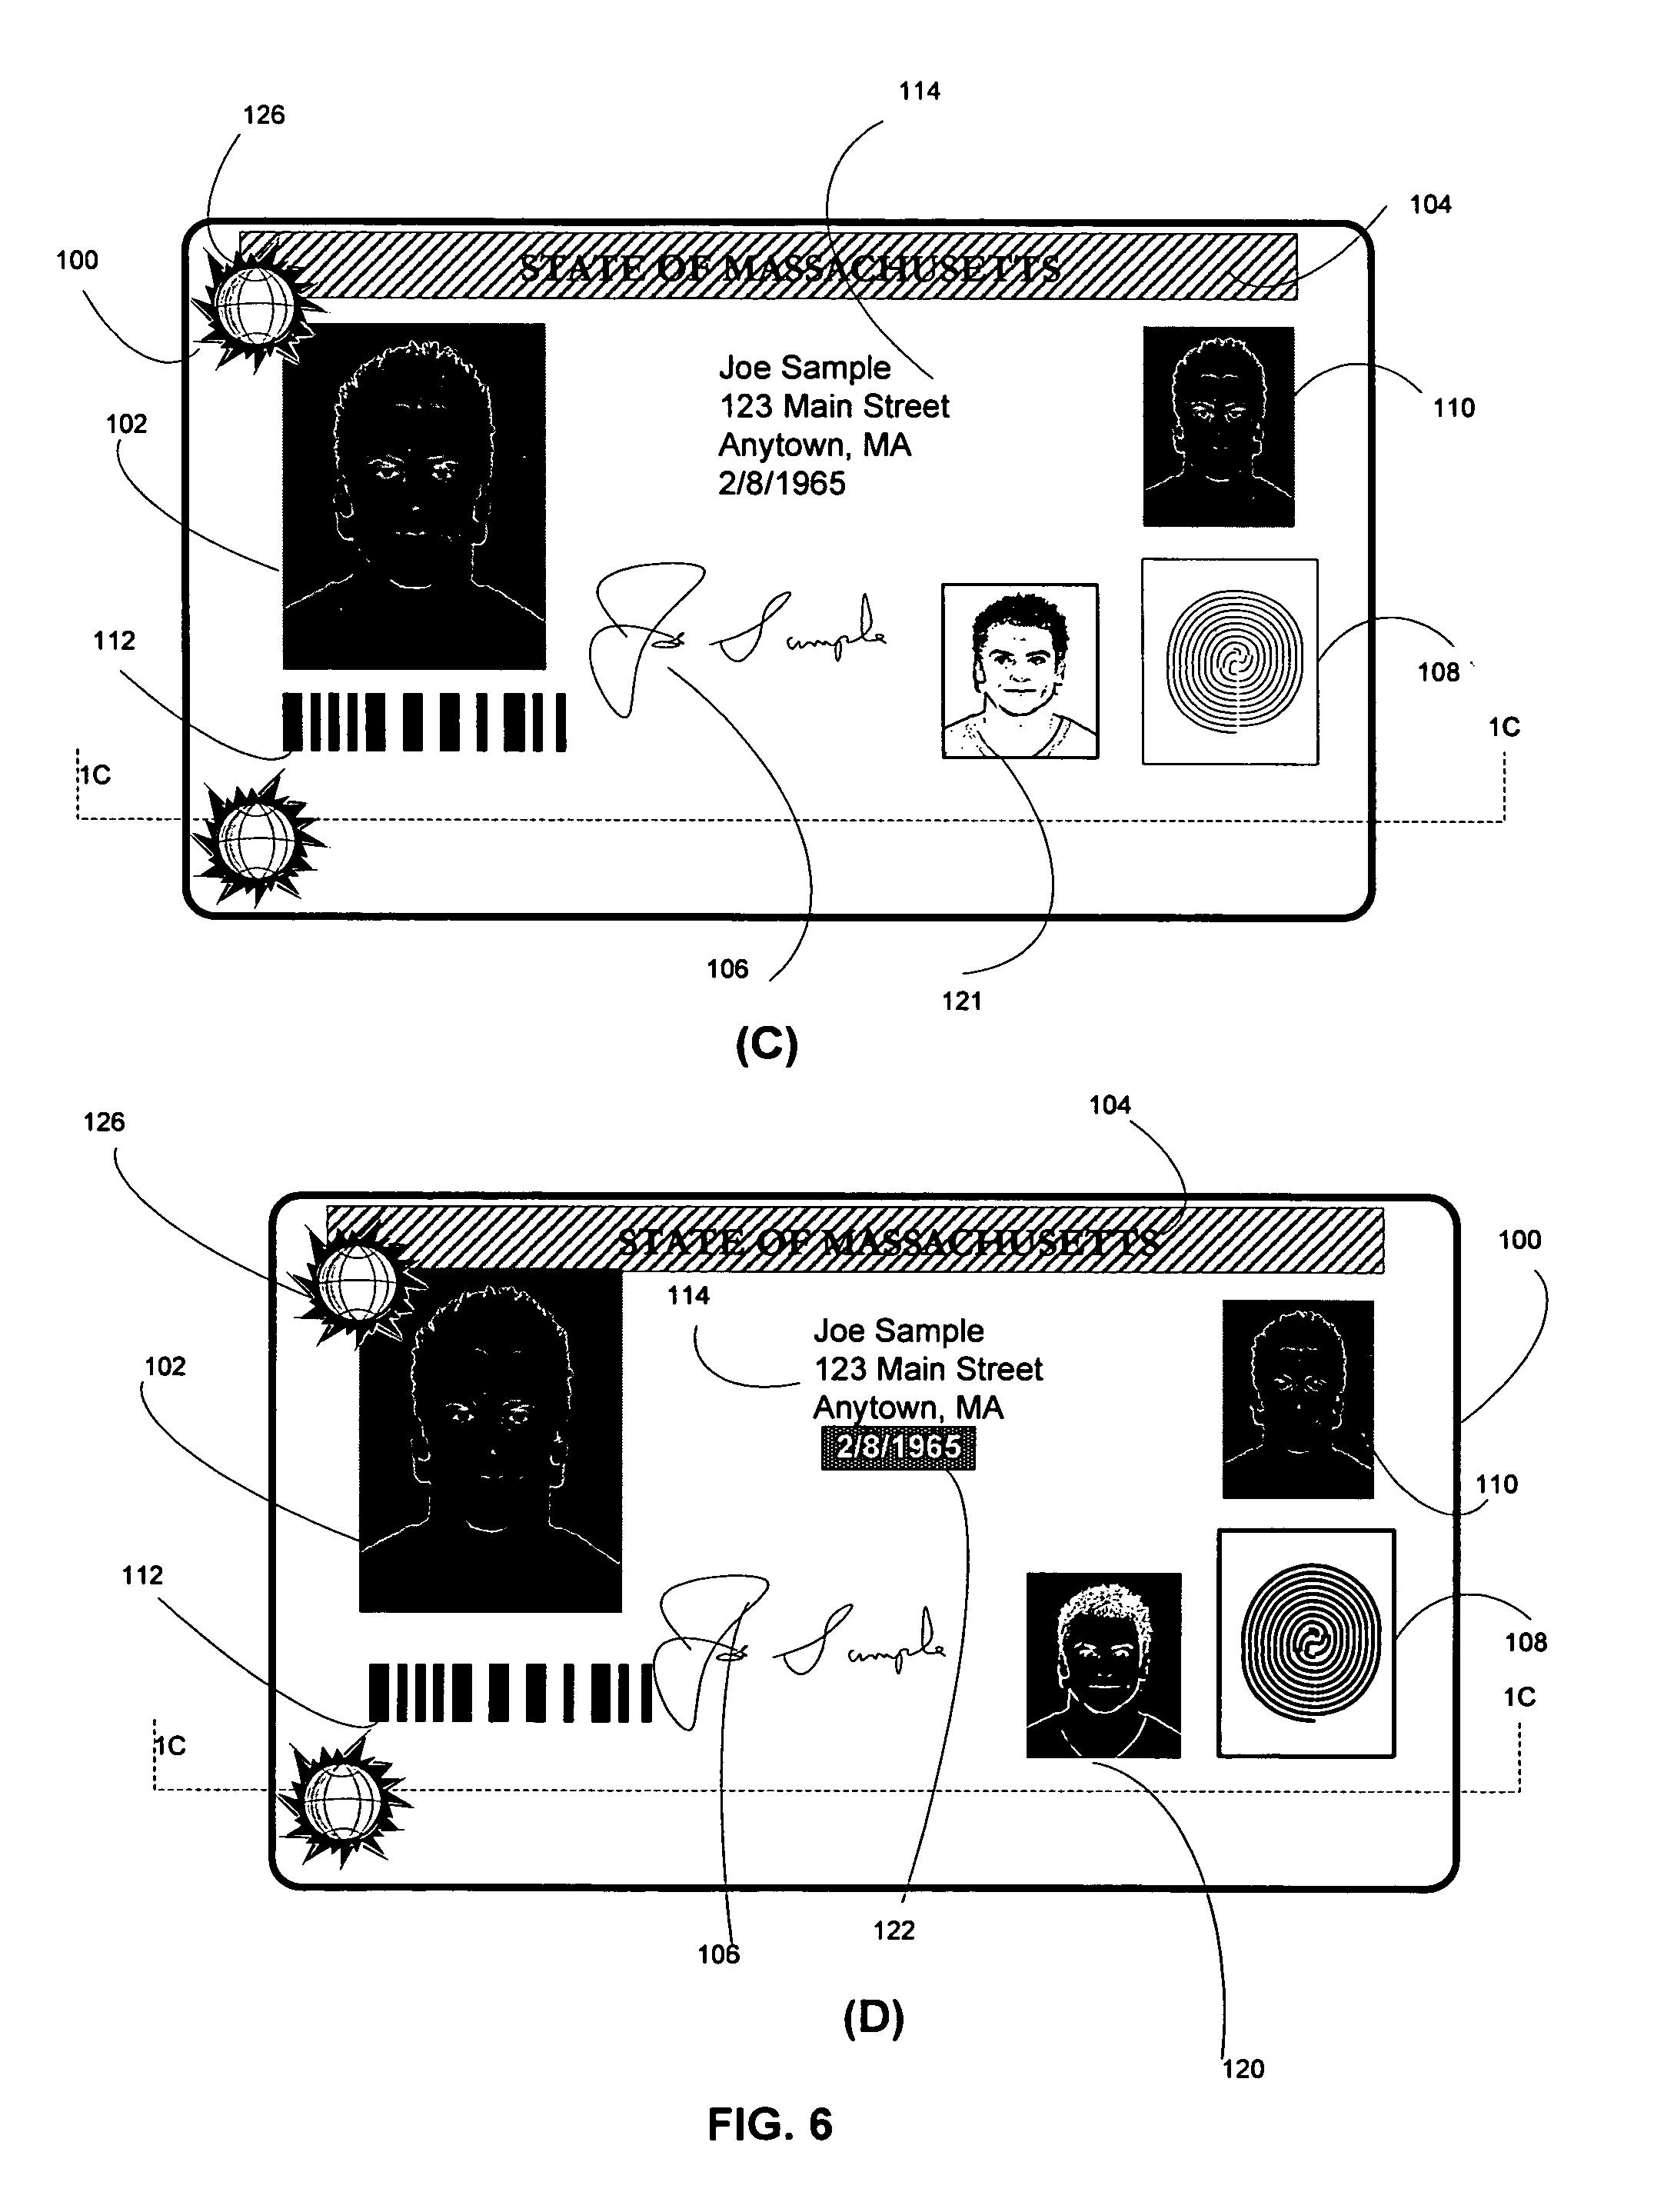 Patent US 7,694,887 B2